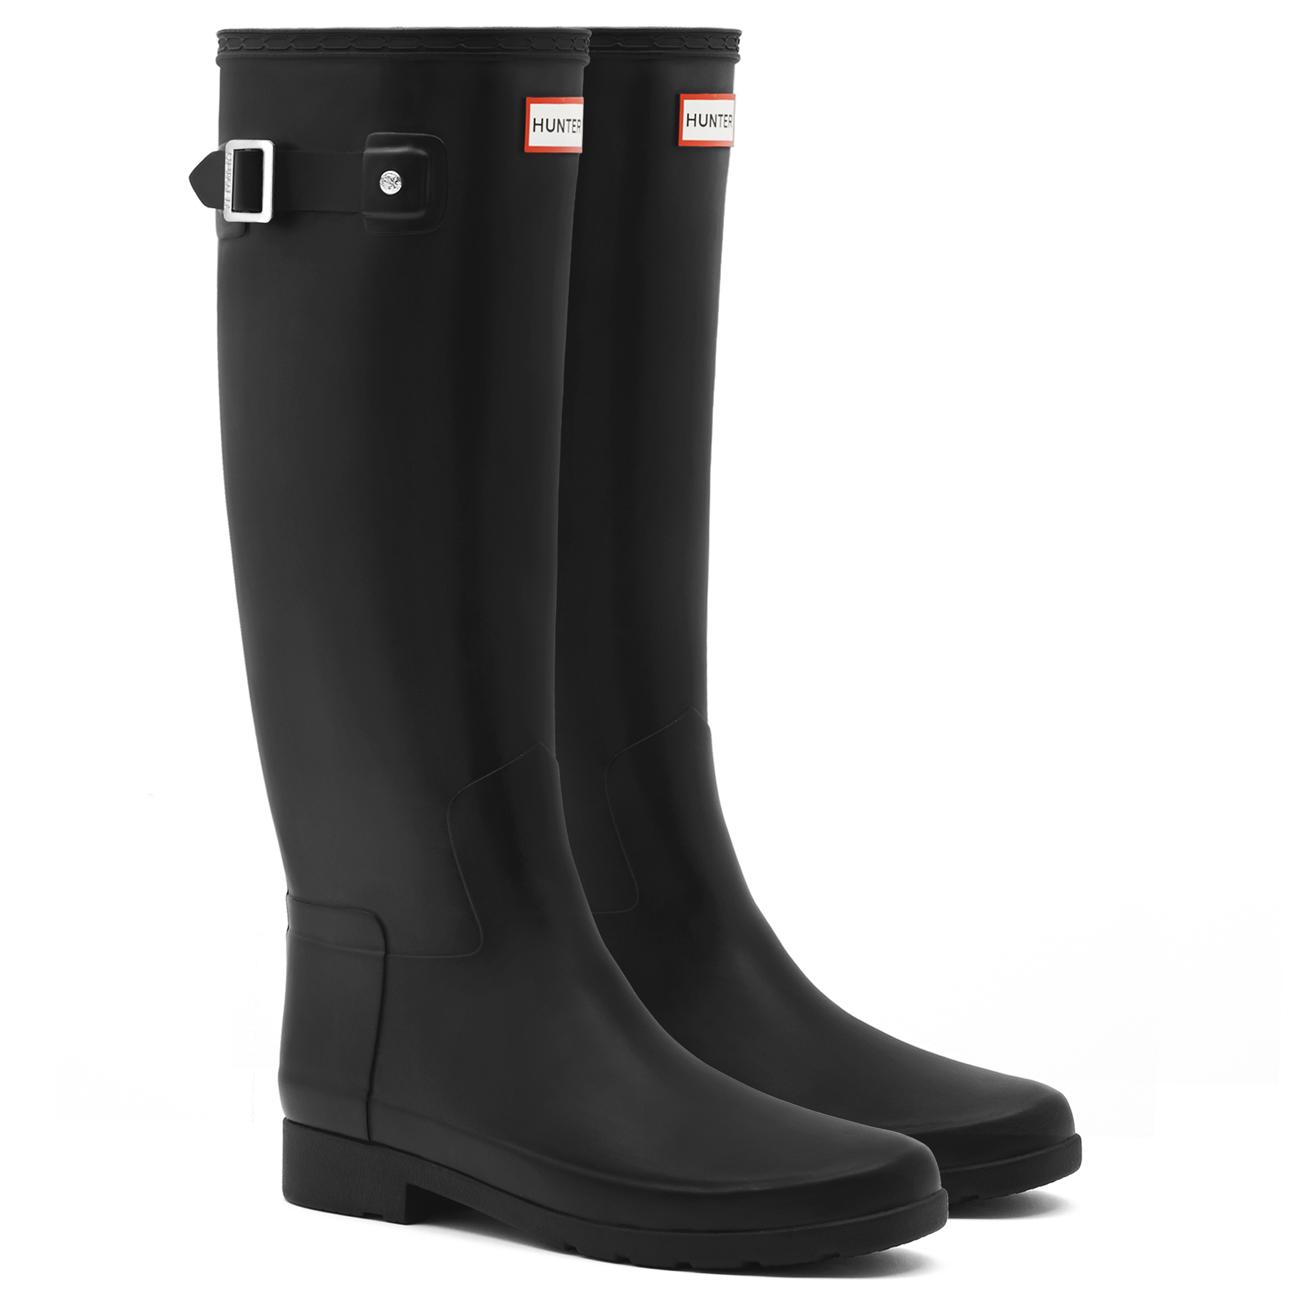 10e4513fb Womens Hunter Original Refined Waterproof Snow Wellingtons Rain ...